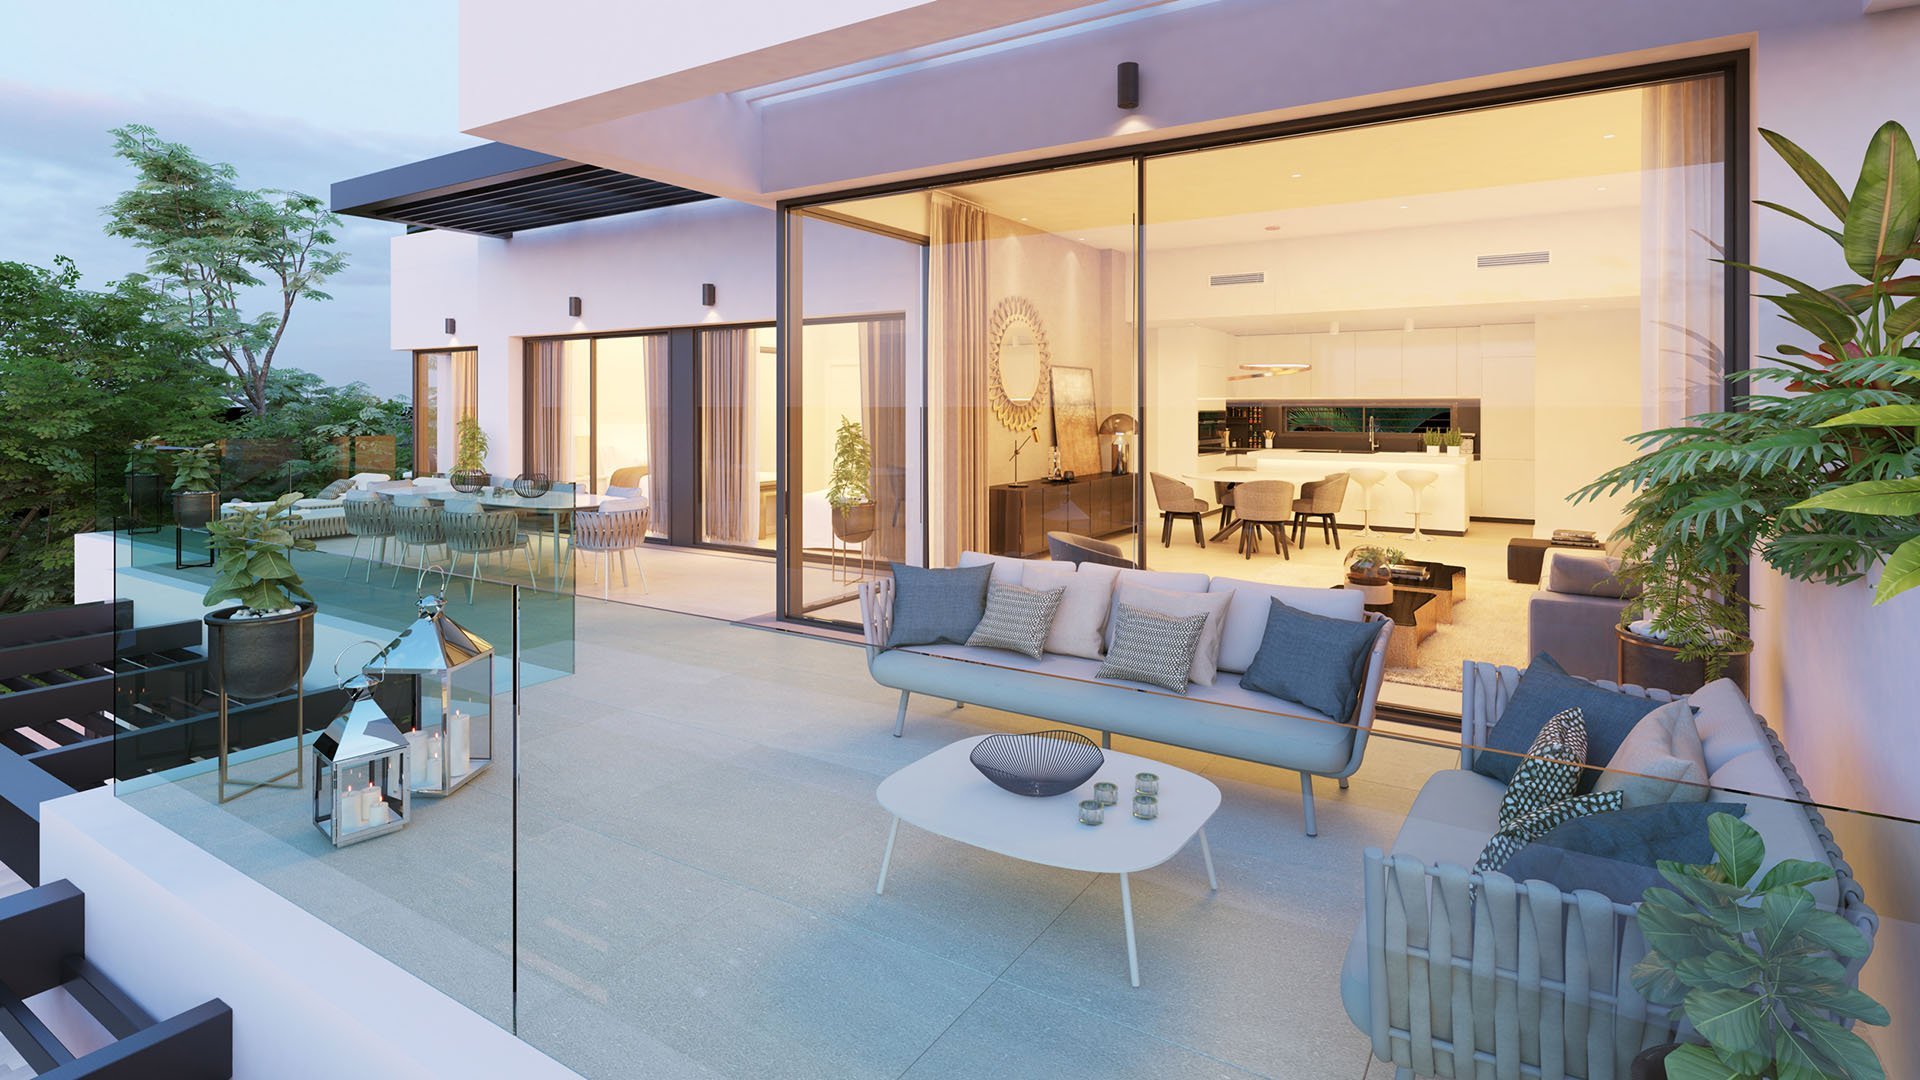 Aqualina: Exclusive apartments with panoramic sea views in Benahavís